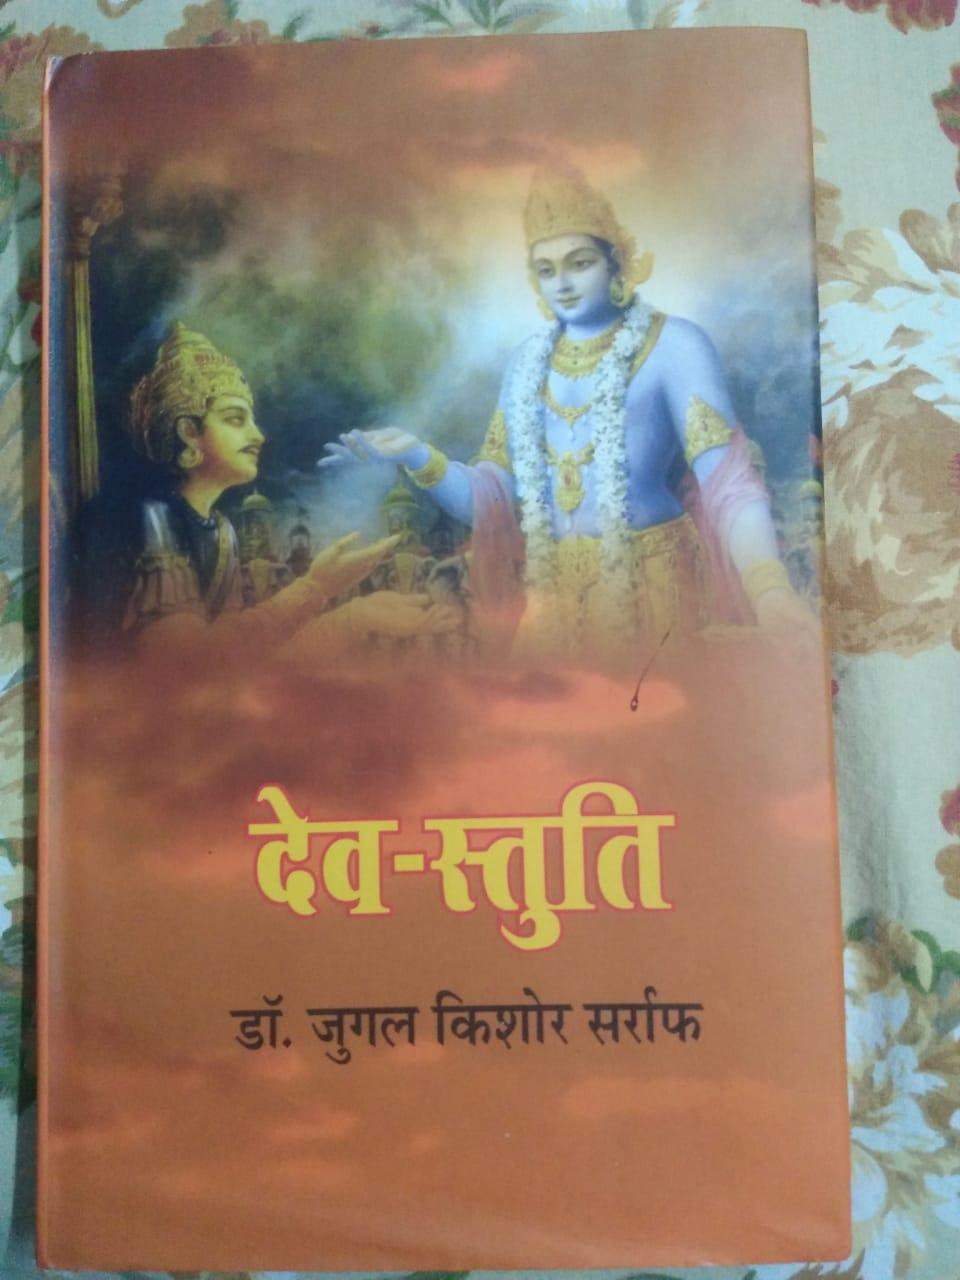 भारतीय ज्ञानपीठ से प्रकाशित भागवत पुराण पर आधारित आध्यात्मिक पुस्तक